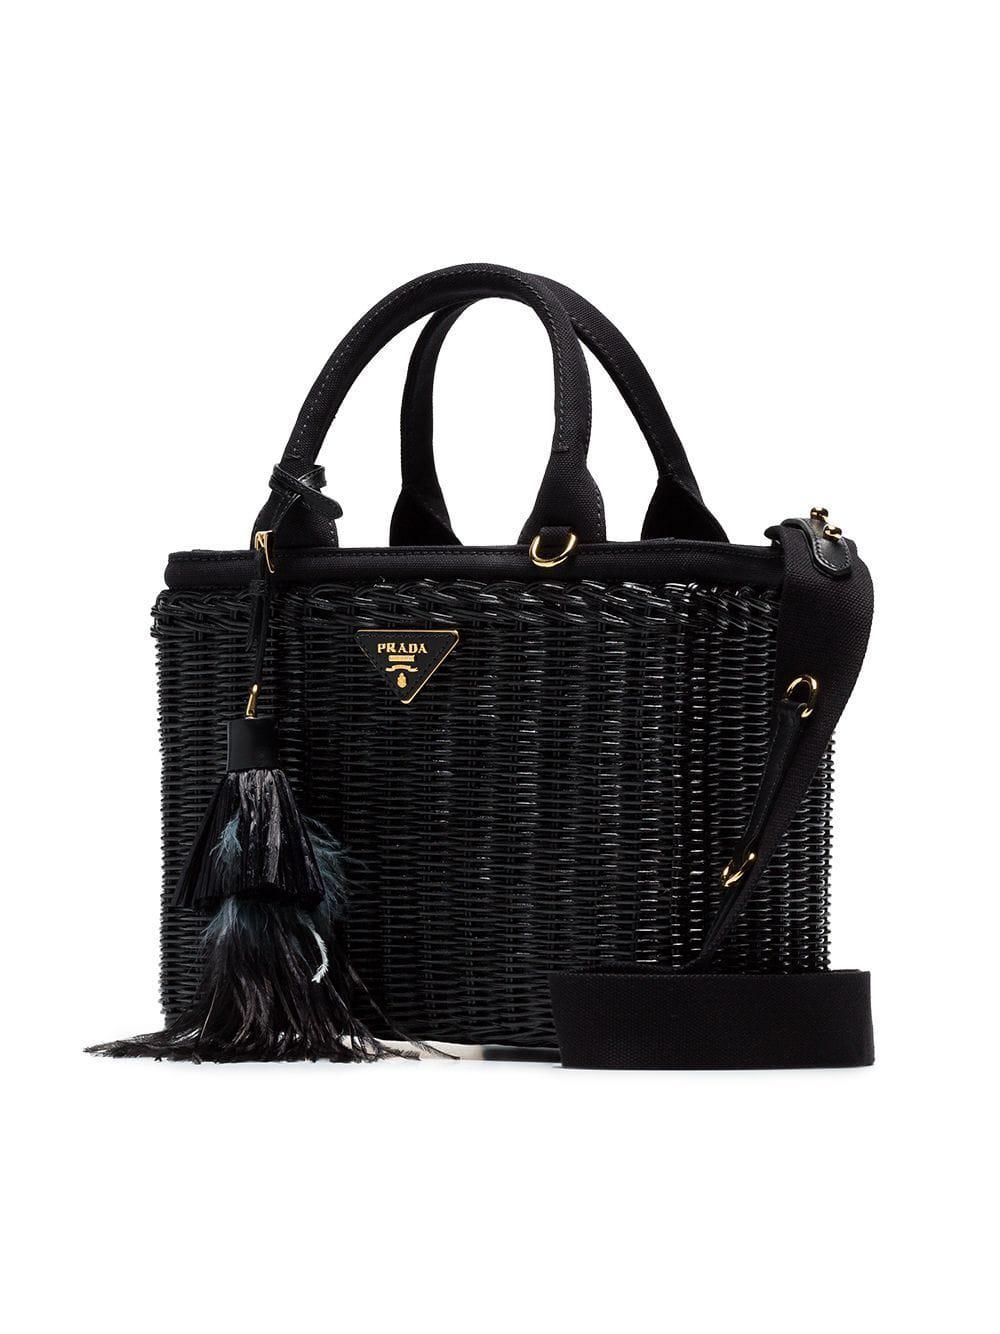 Prada Black Canvas And Wicker Woven Bag in Black - Lyst 7cfa88cd11a13